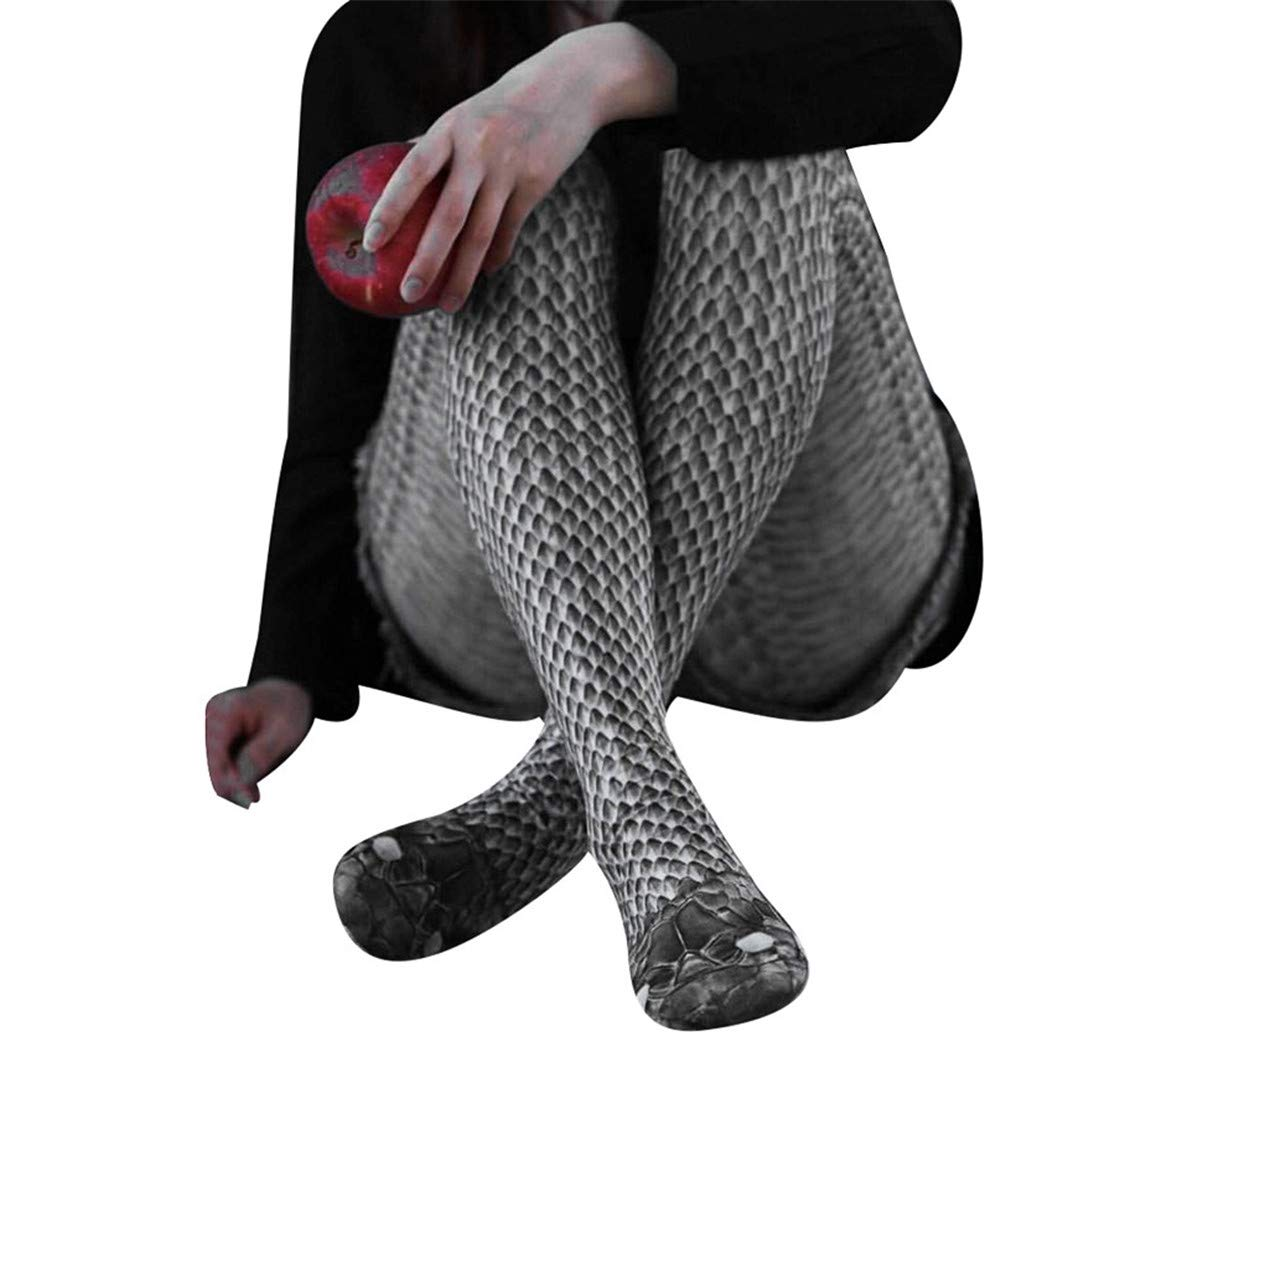 TIFENNY Women's Fashion Snake Pattern Printed Trousers Yoga Fitness Leggings Running Gym Stretch Sports Pants